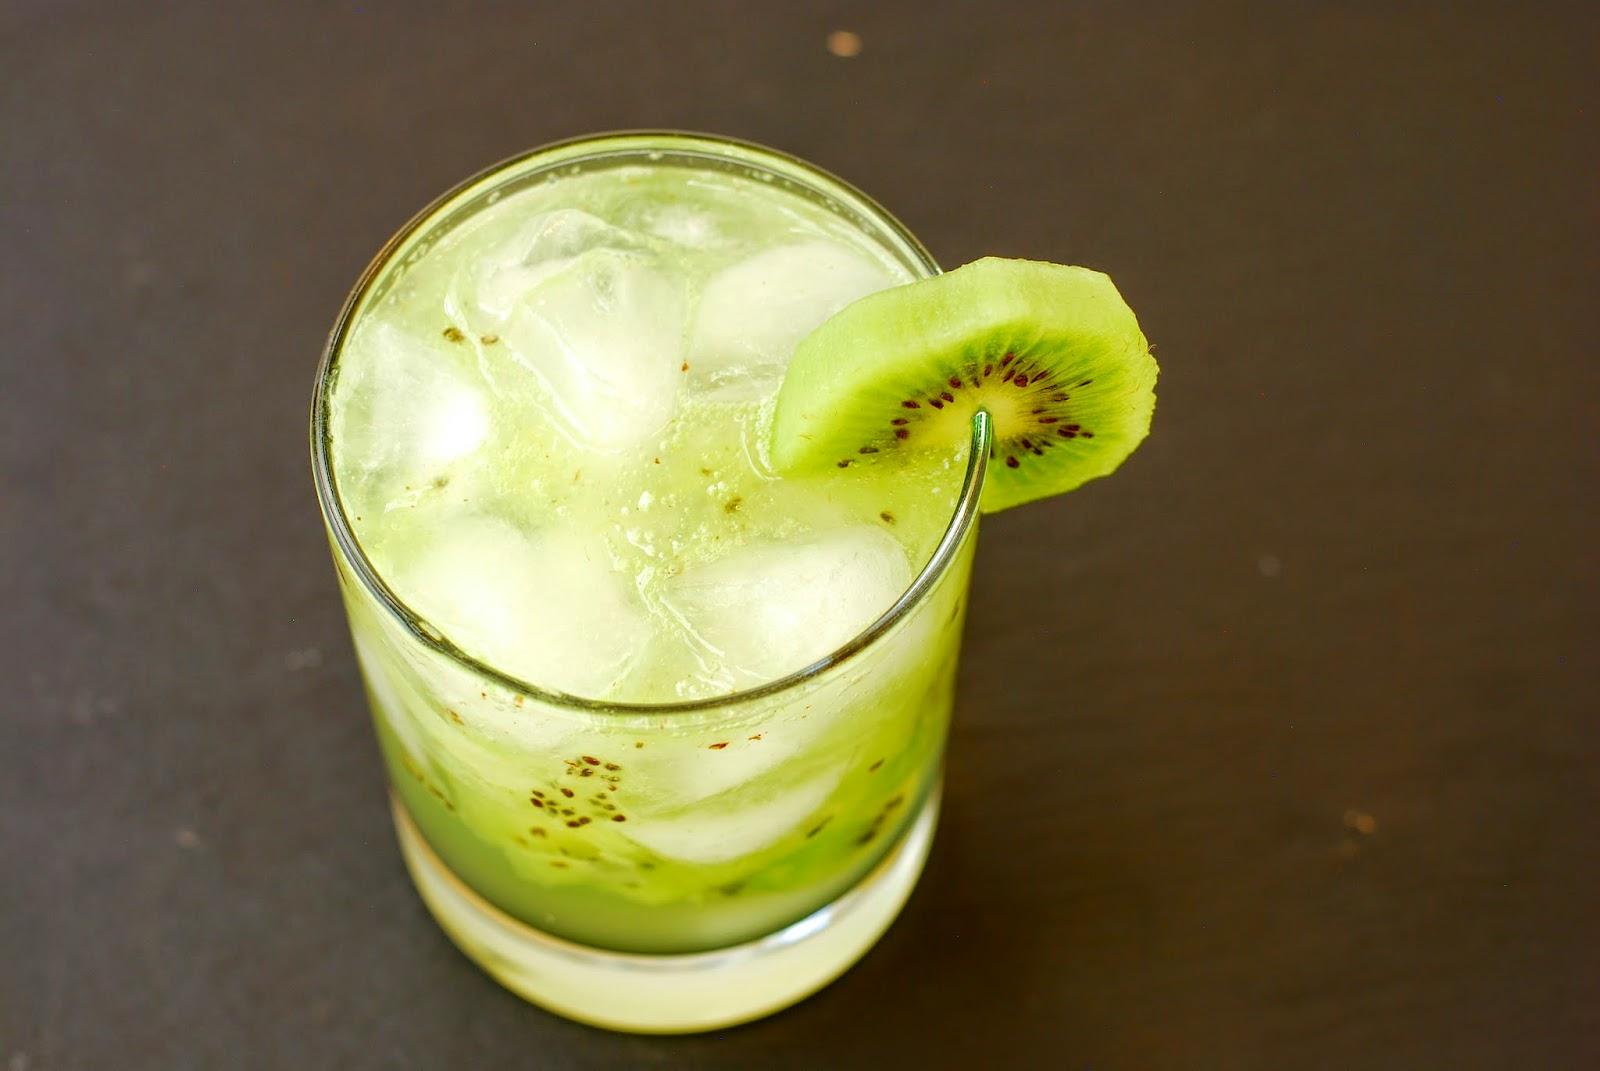 ... kiwi vodka tonic smirnoff vodka kiwi collins kiwi summer cocktail